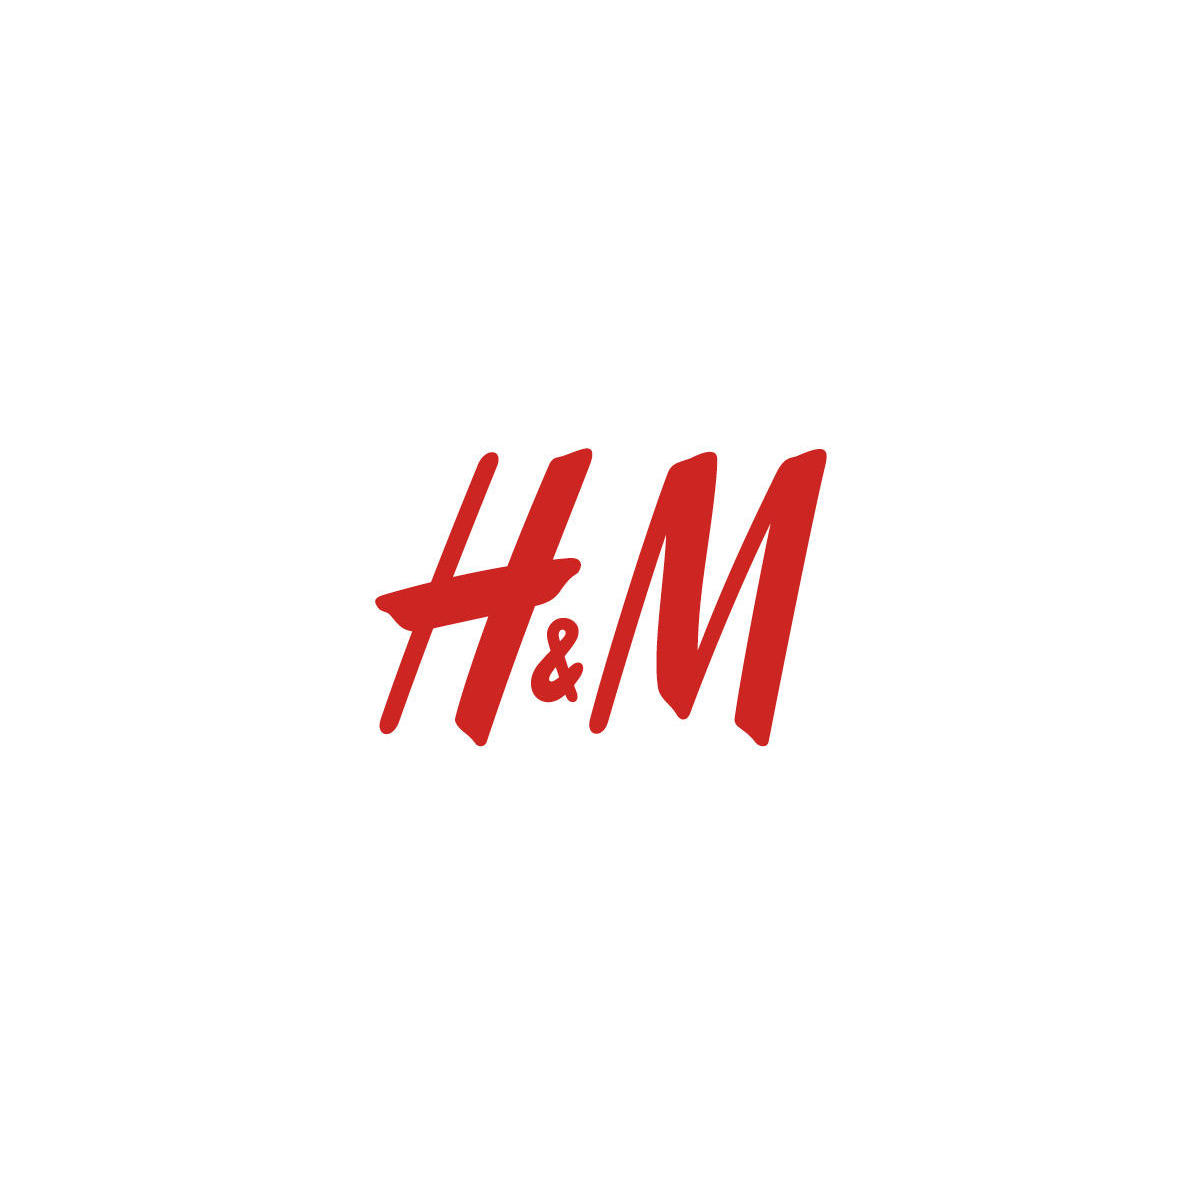 H&M image 23